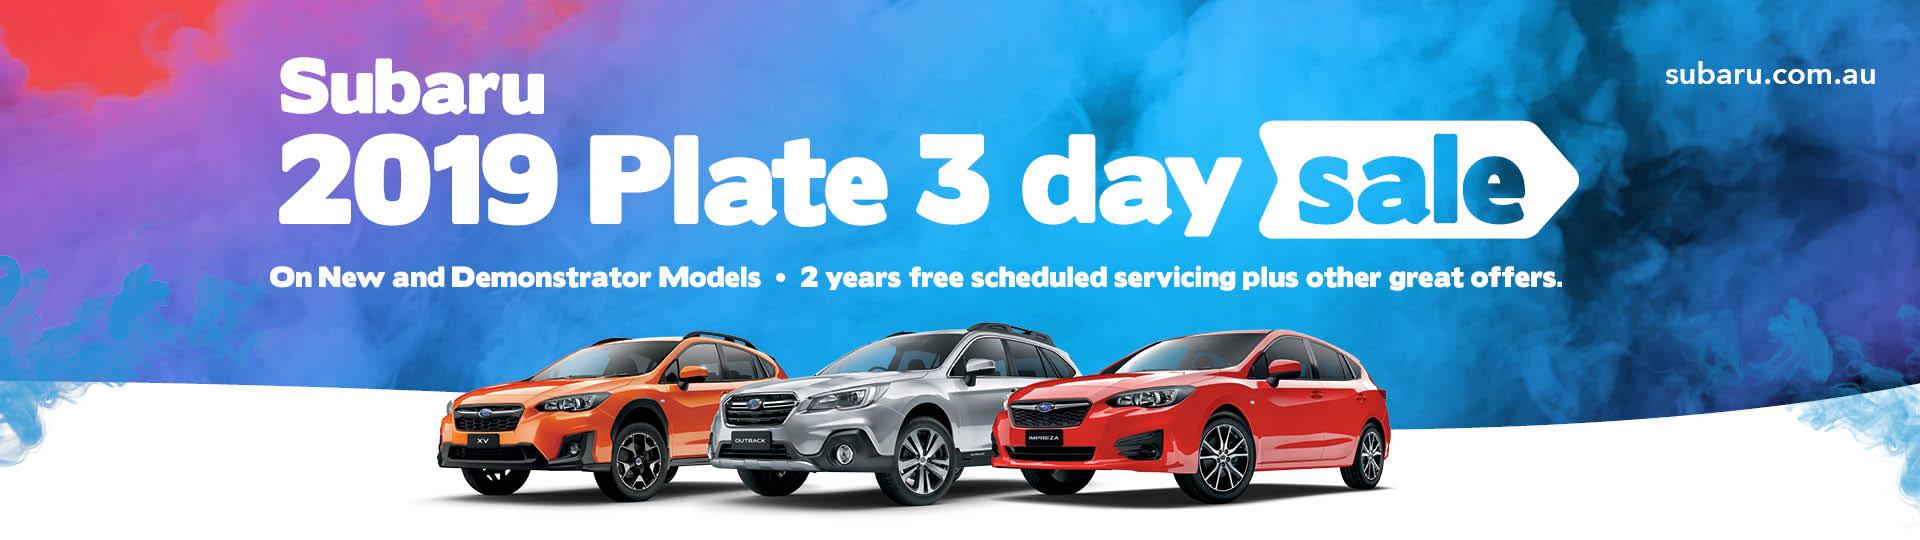 Subaru 3 day sale event